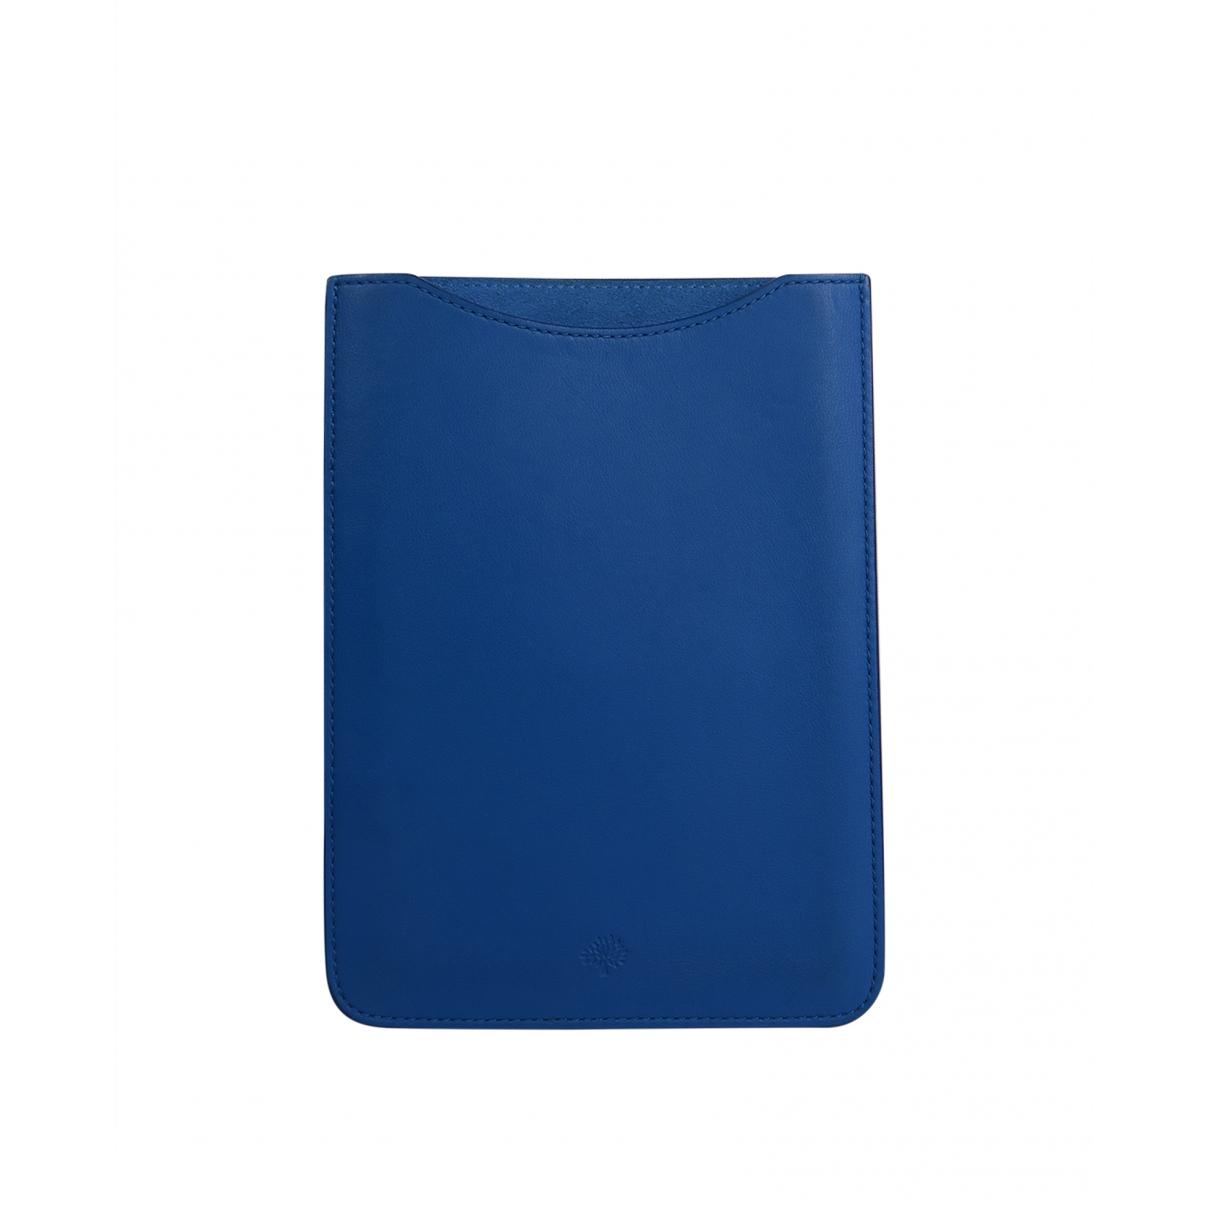 Mulberry \N Accessoires in  Blau Leder